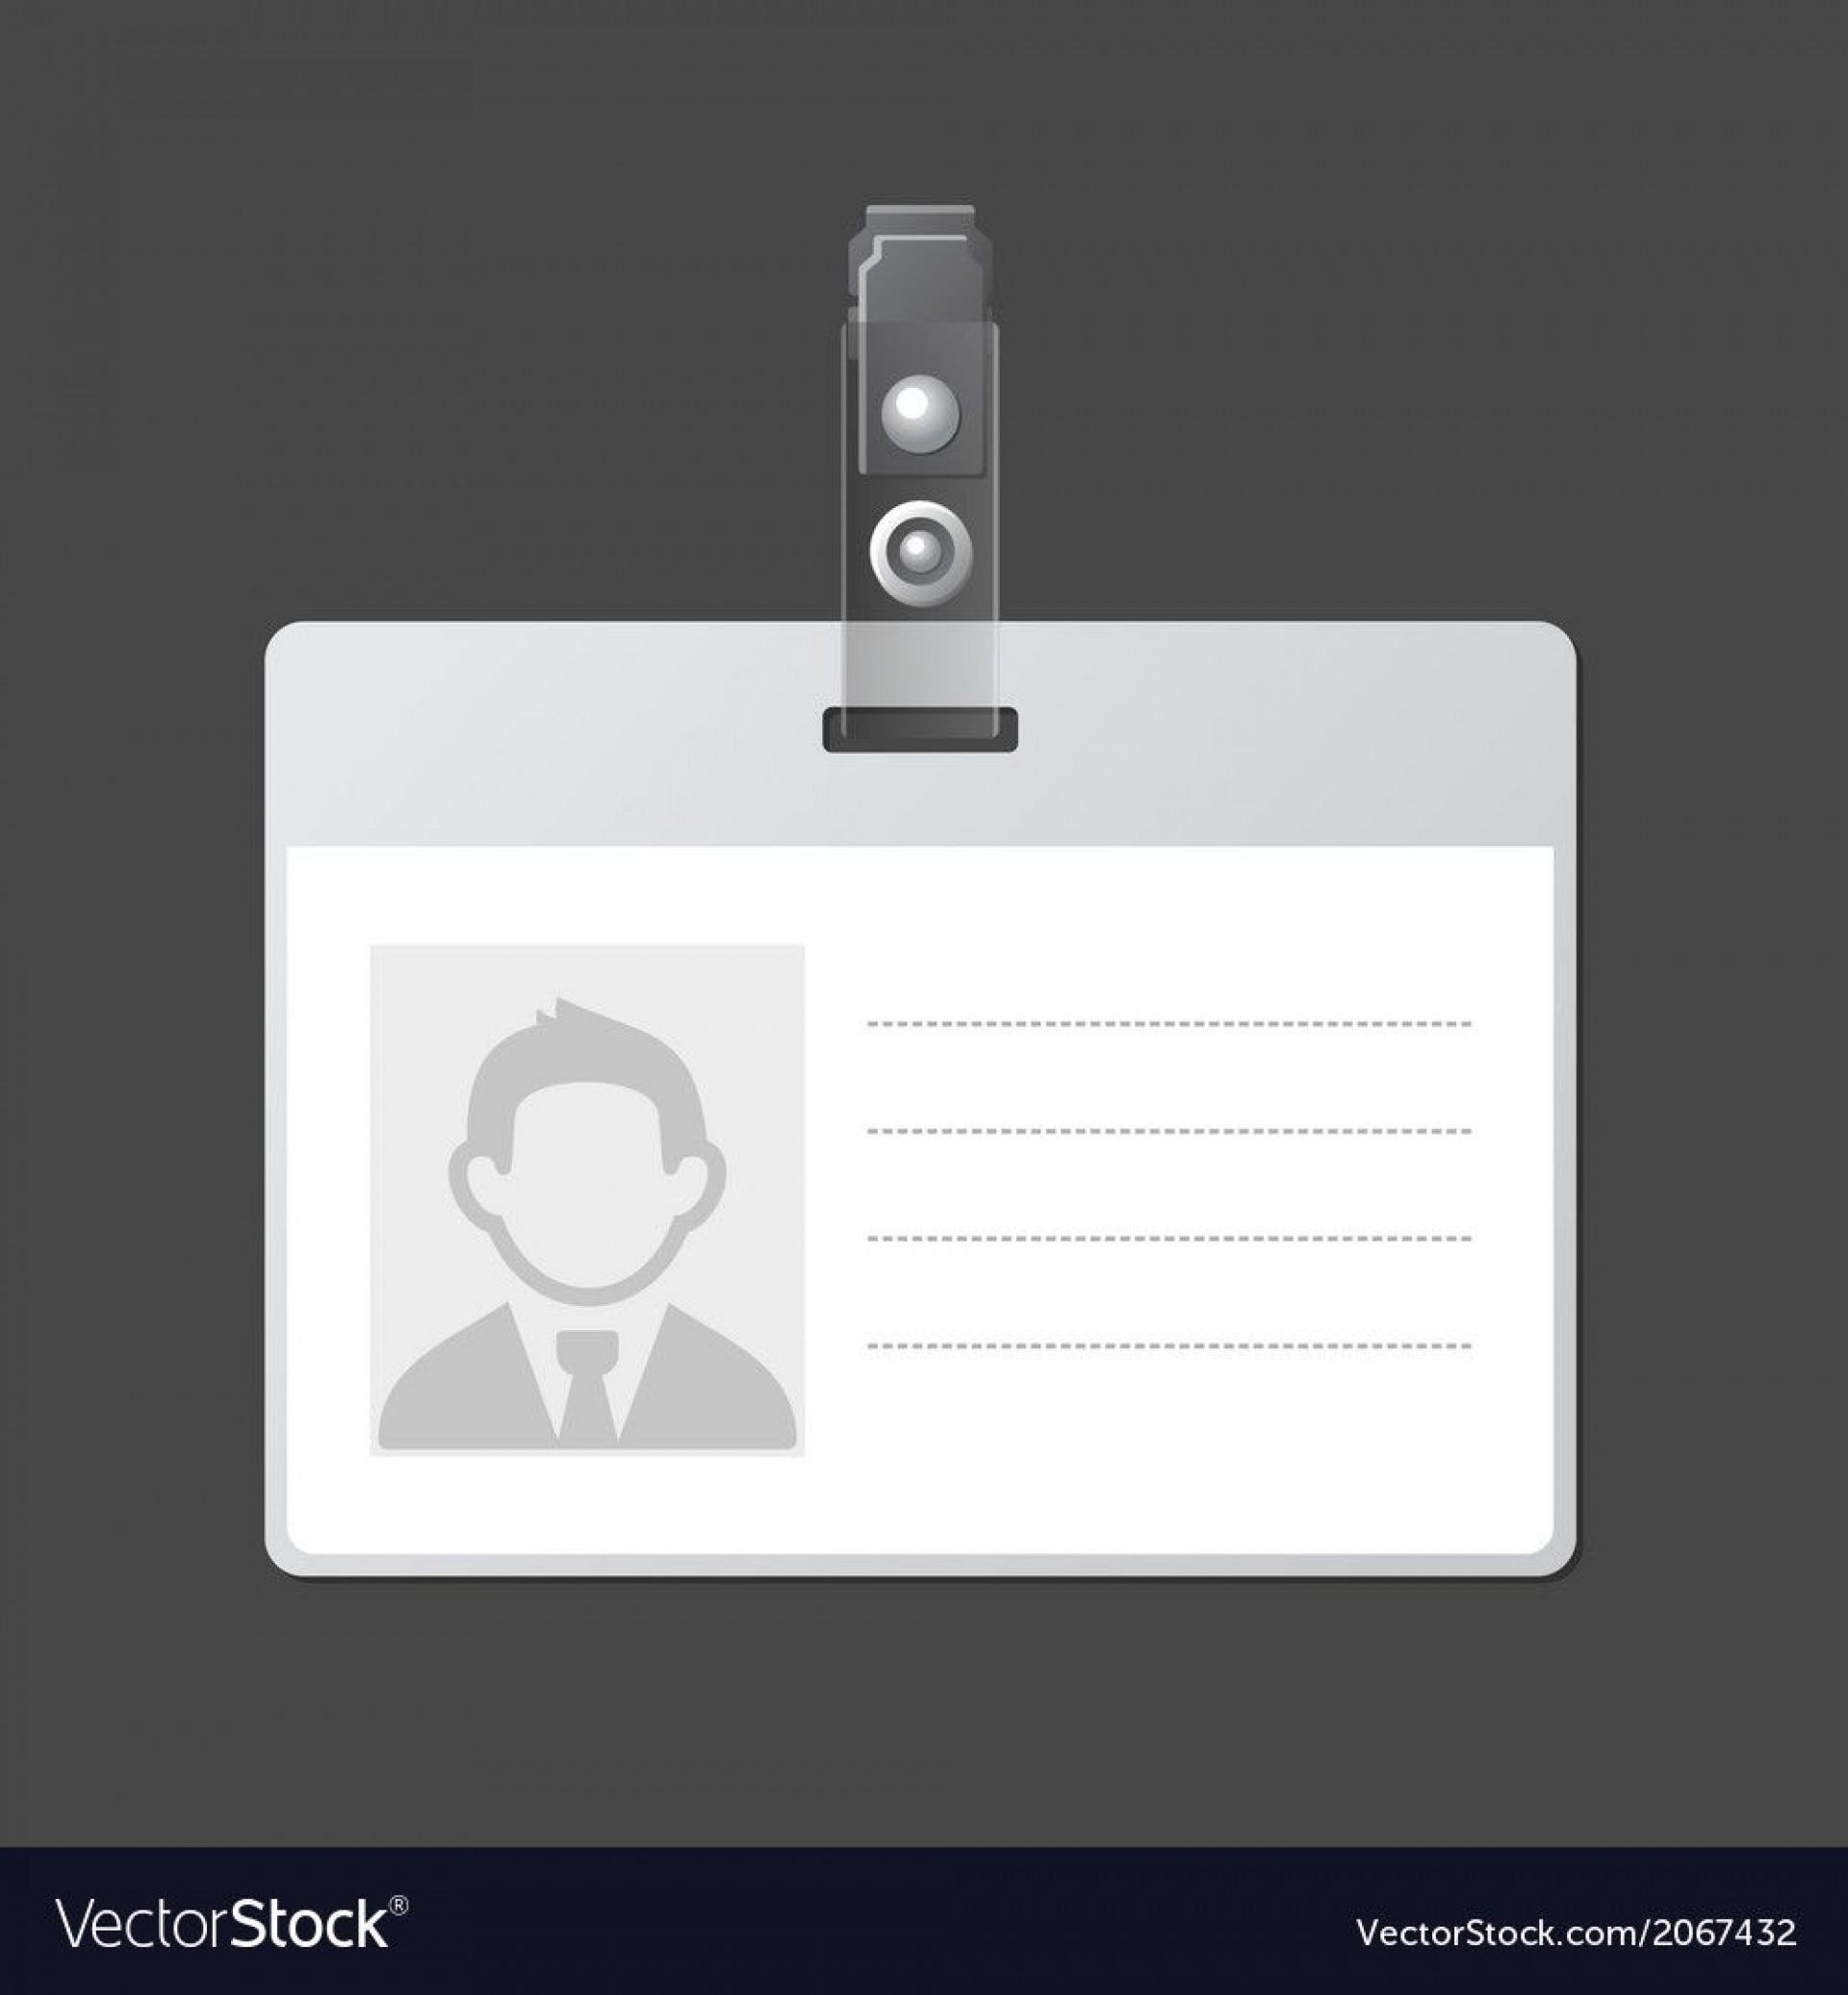 006 Breathtaking Blank Id Card Template Idea  Design Free Download Editable1920